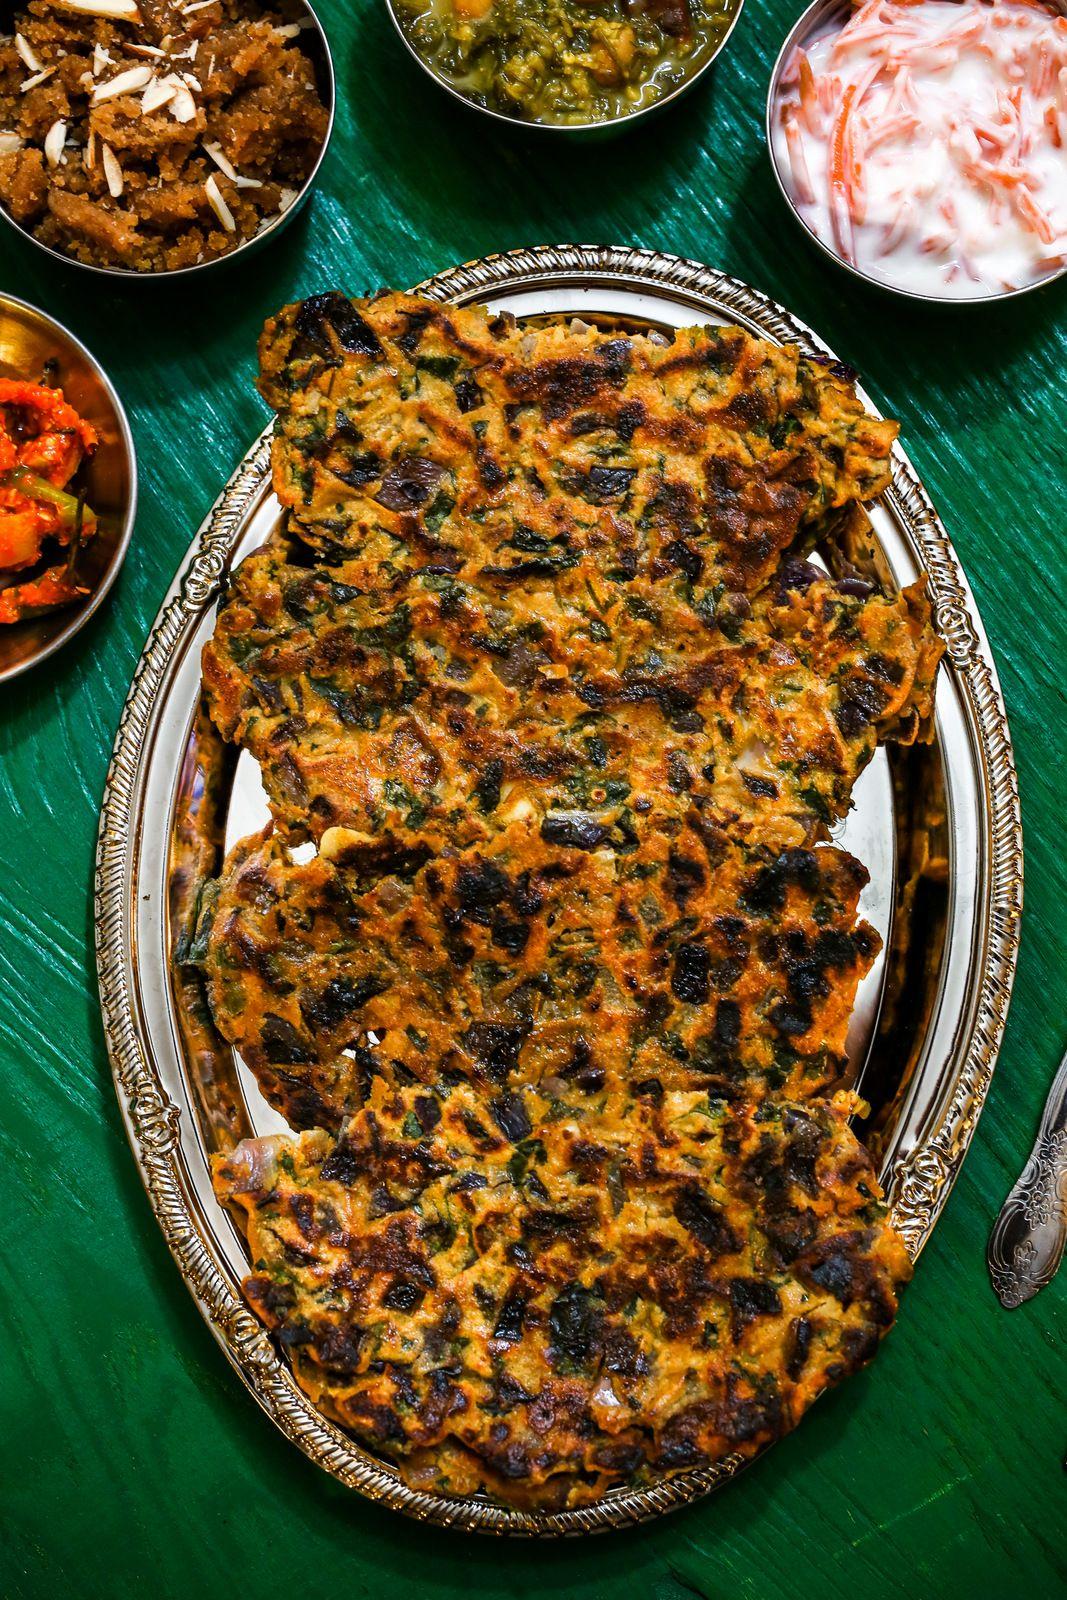 Thalipeeth ghavacha sheera shepuchi bhaji recipe thalipeeth recipe shepuchi bhaji recipe ghavacha sheera recipe marathi recipes marathi food forumfinder Image collections